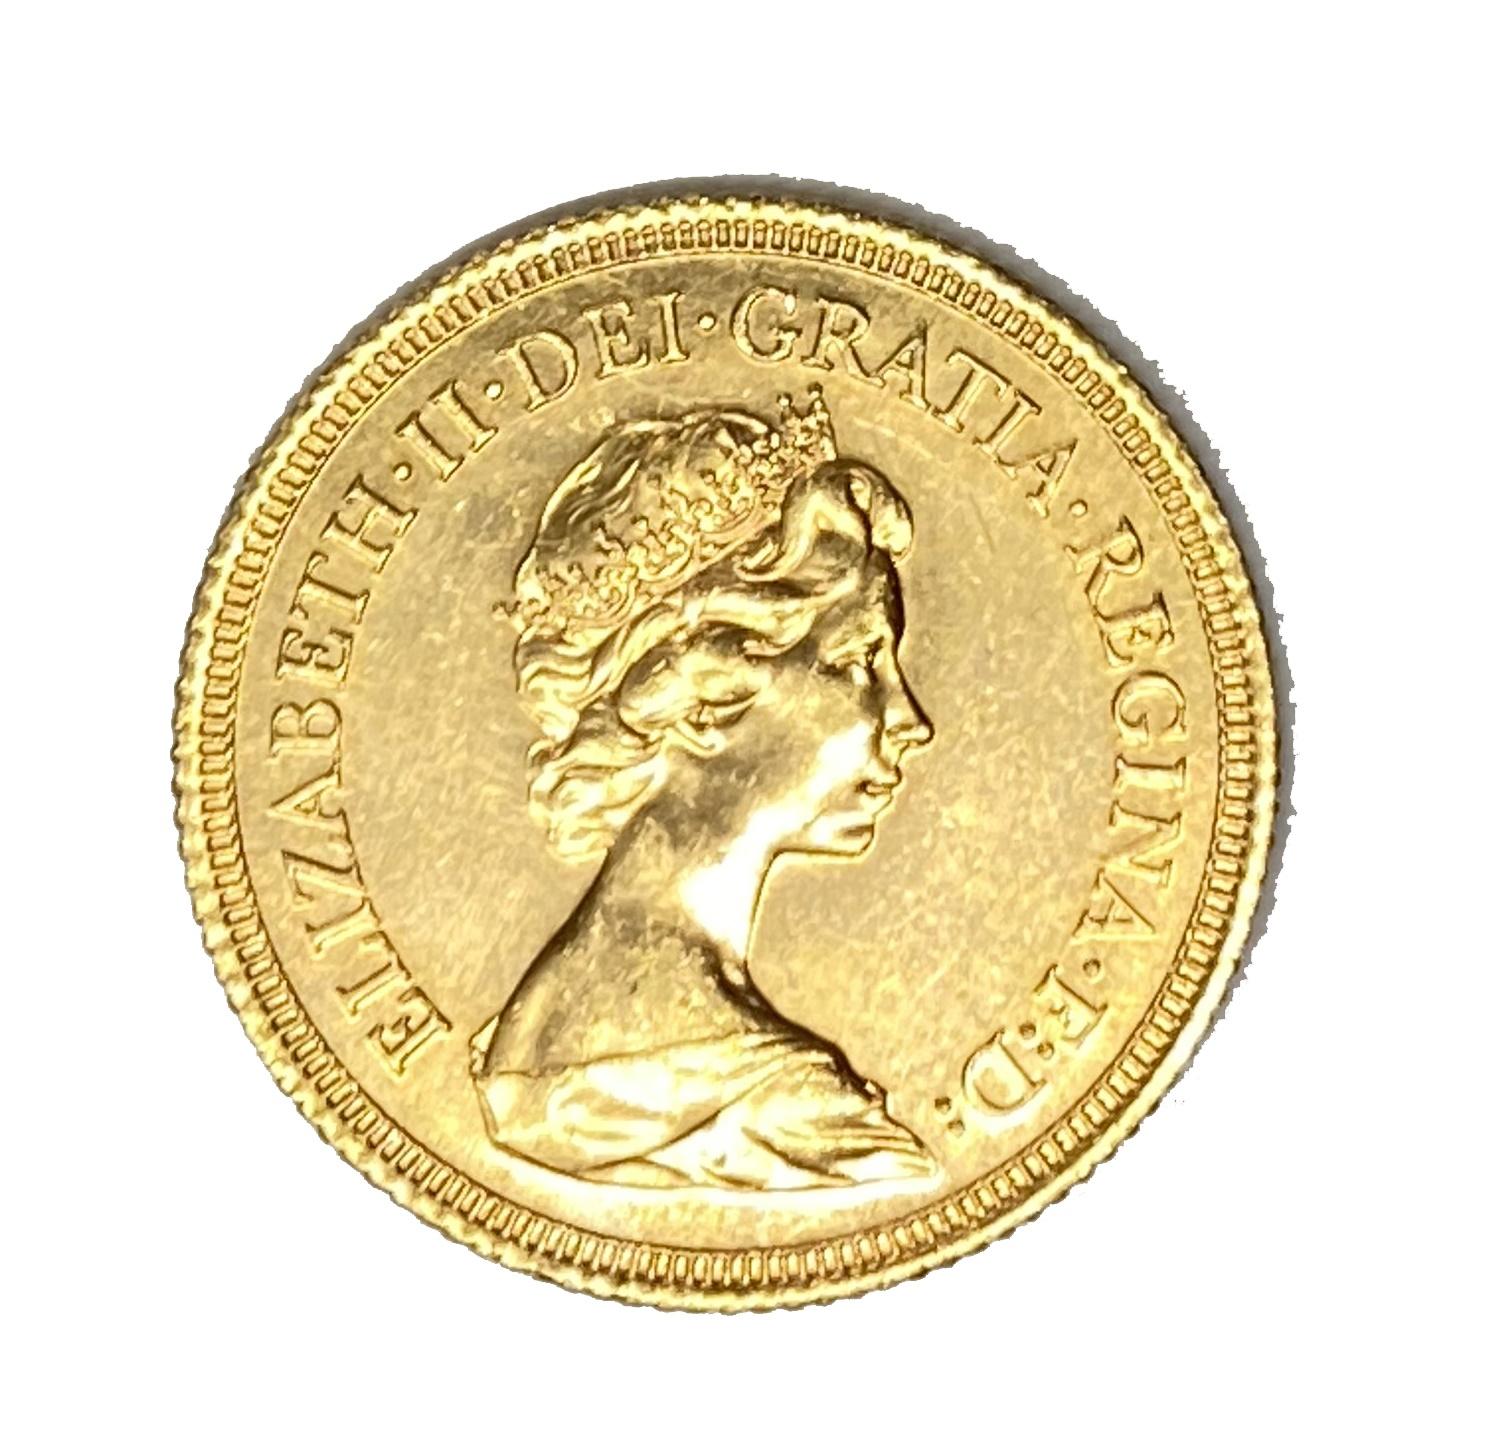 Elizabeth II gold Sovereign coin, 1978